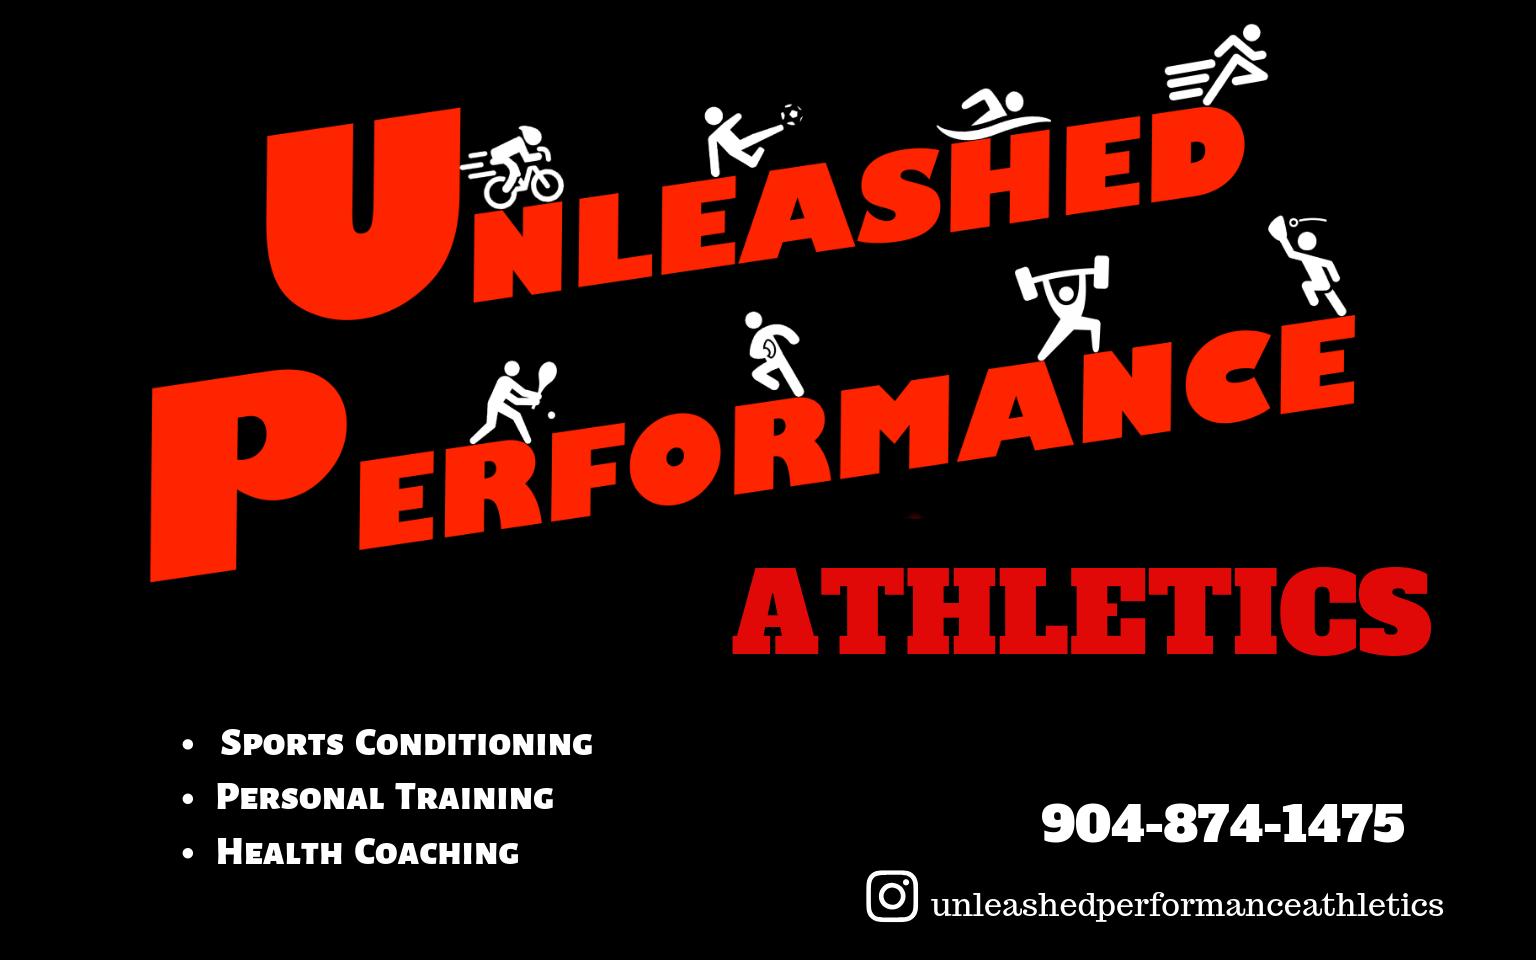 Unleashed Performance Athletics